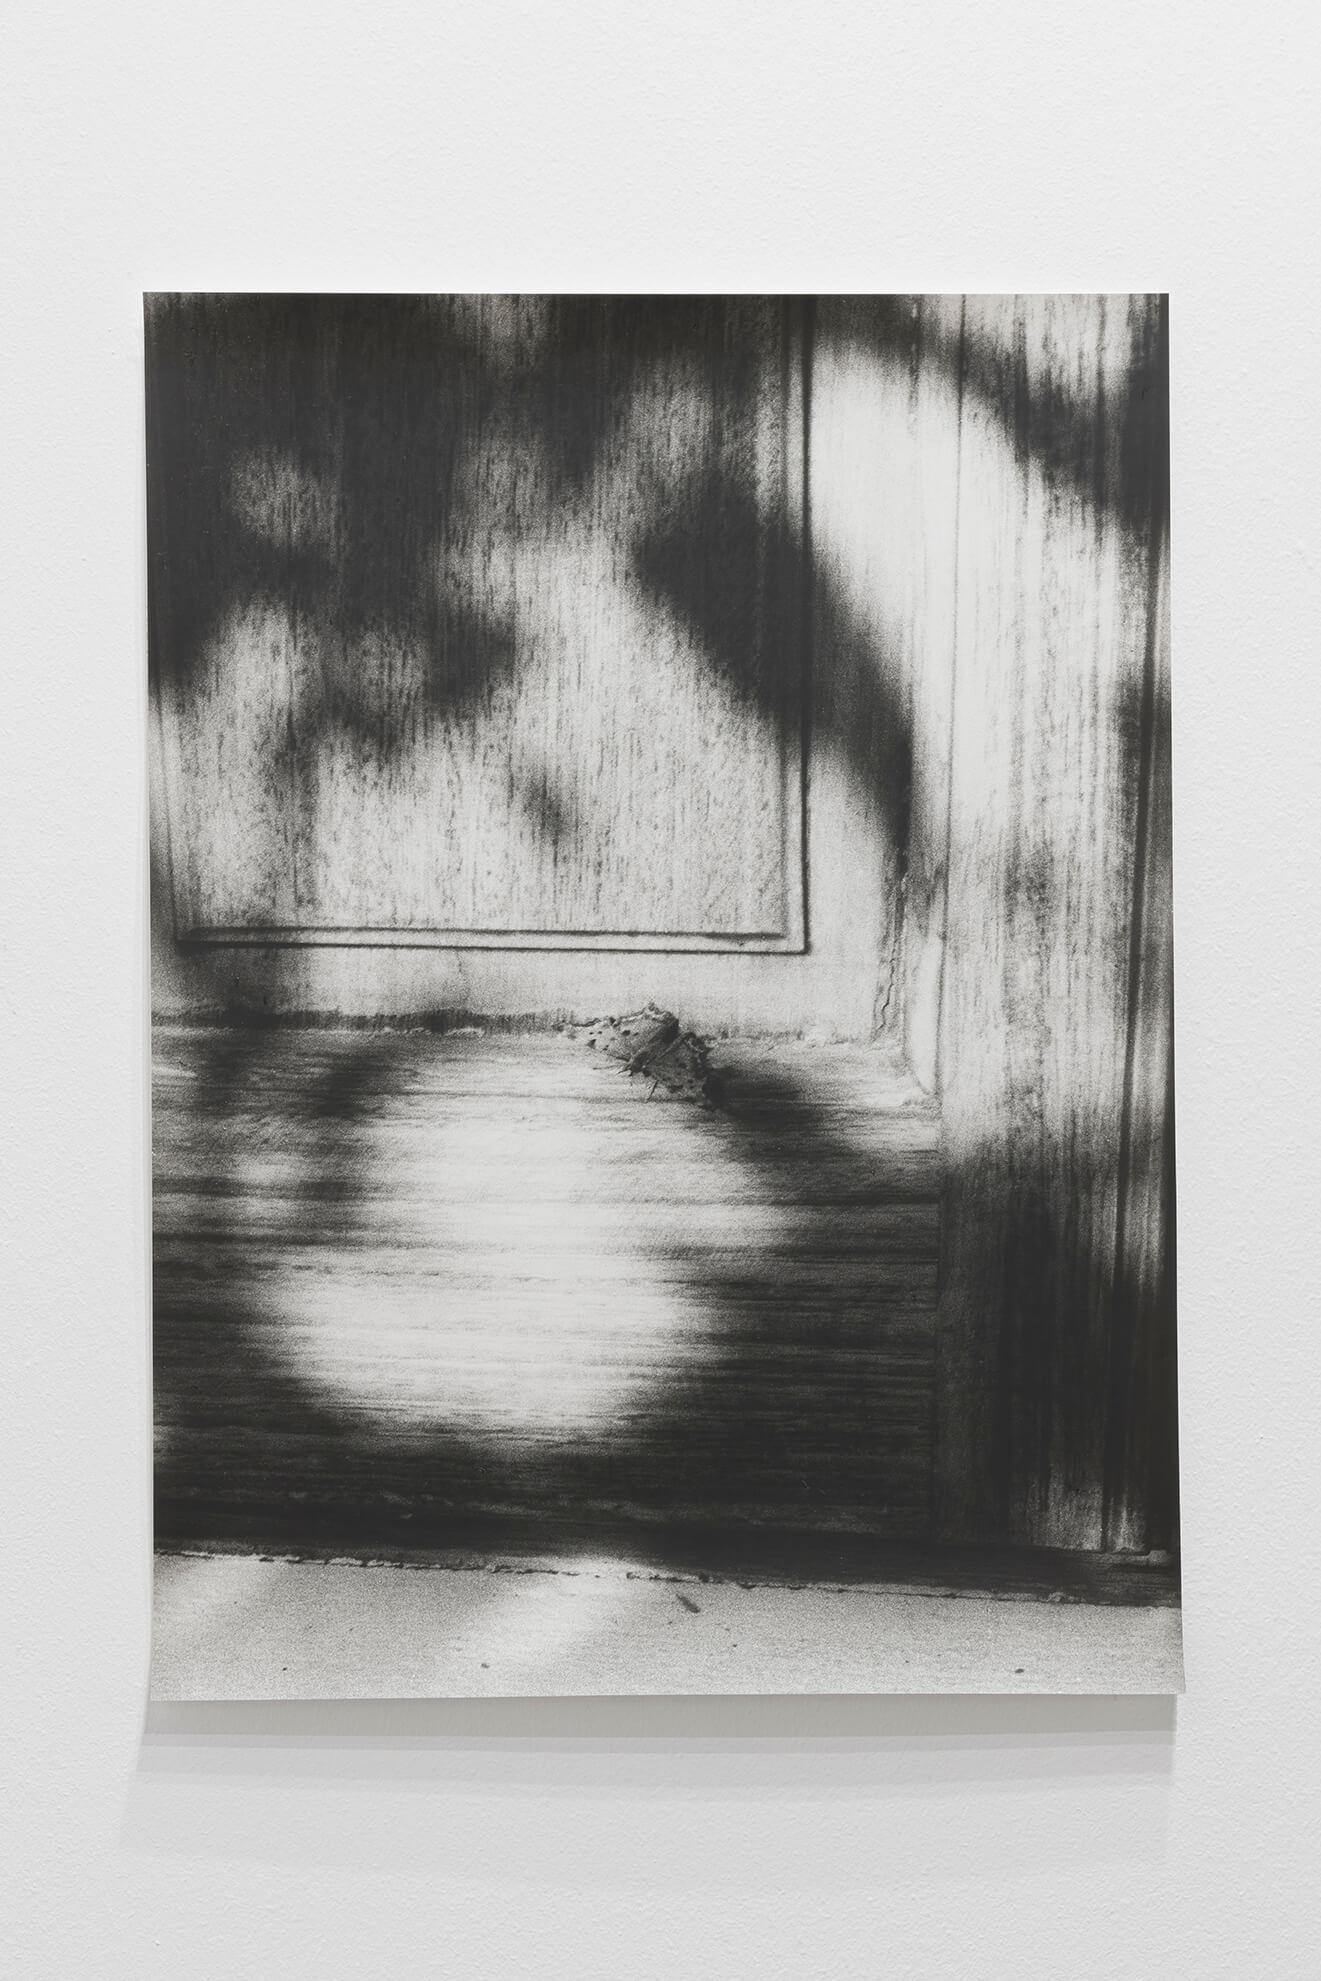 Untitled (Polygonia c-album), 2019 |  | ProjecteSD